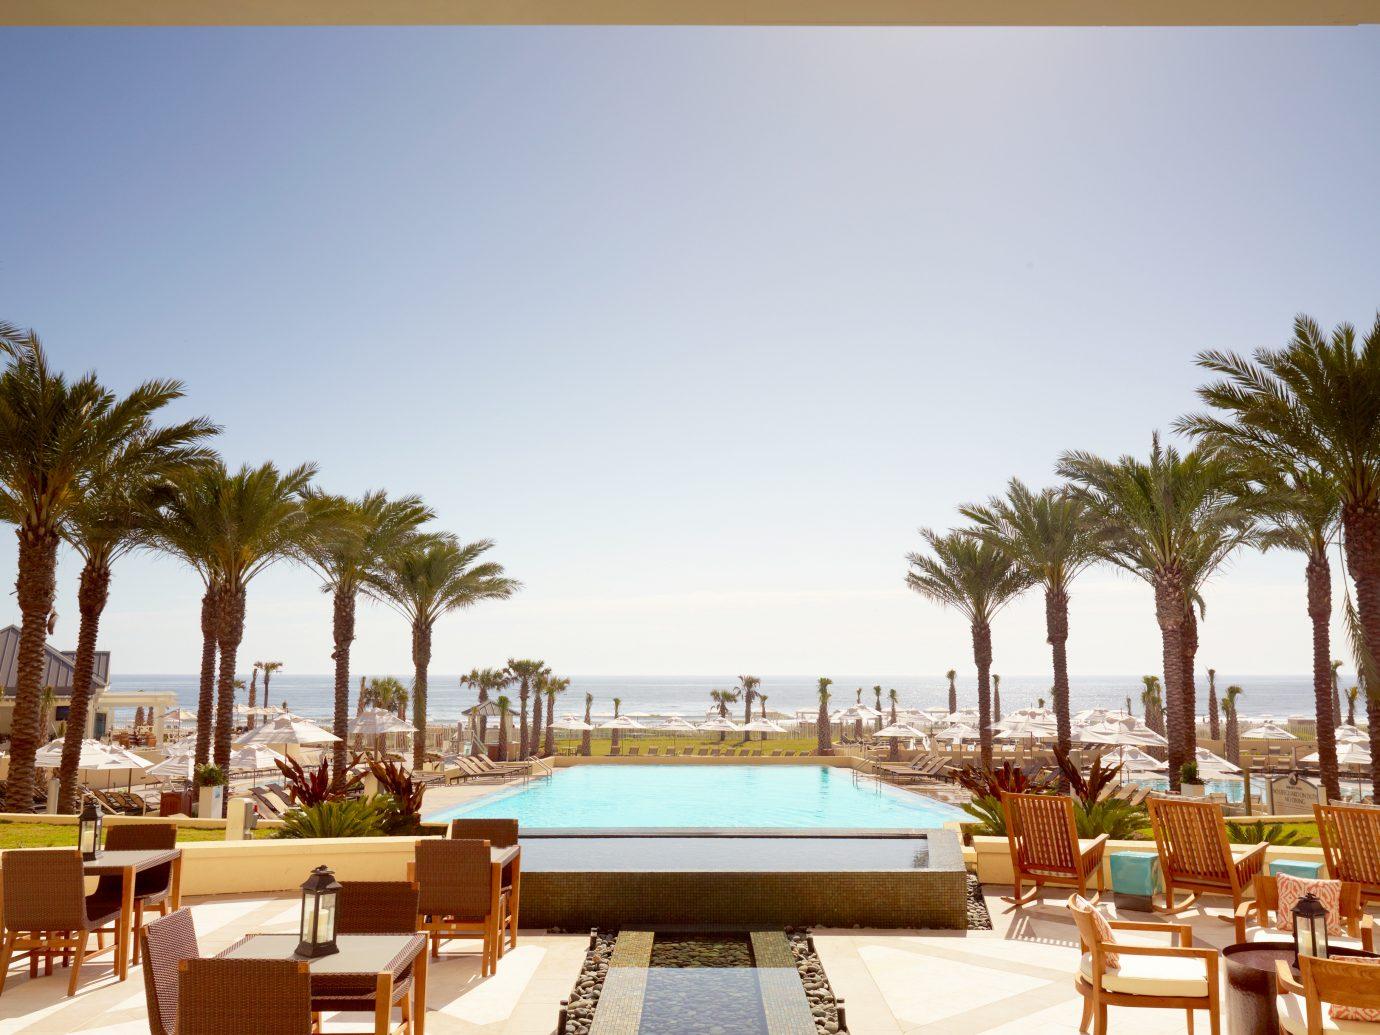 Elegant Living Lounge Pool Trip Ideas sky outdoor property Resort estate vacation condominium restaurant home walkway interior design plaza Villa hacienda Design palace swimming pool